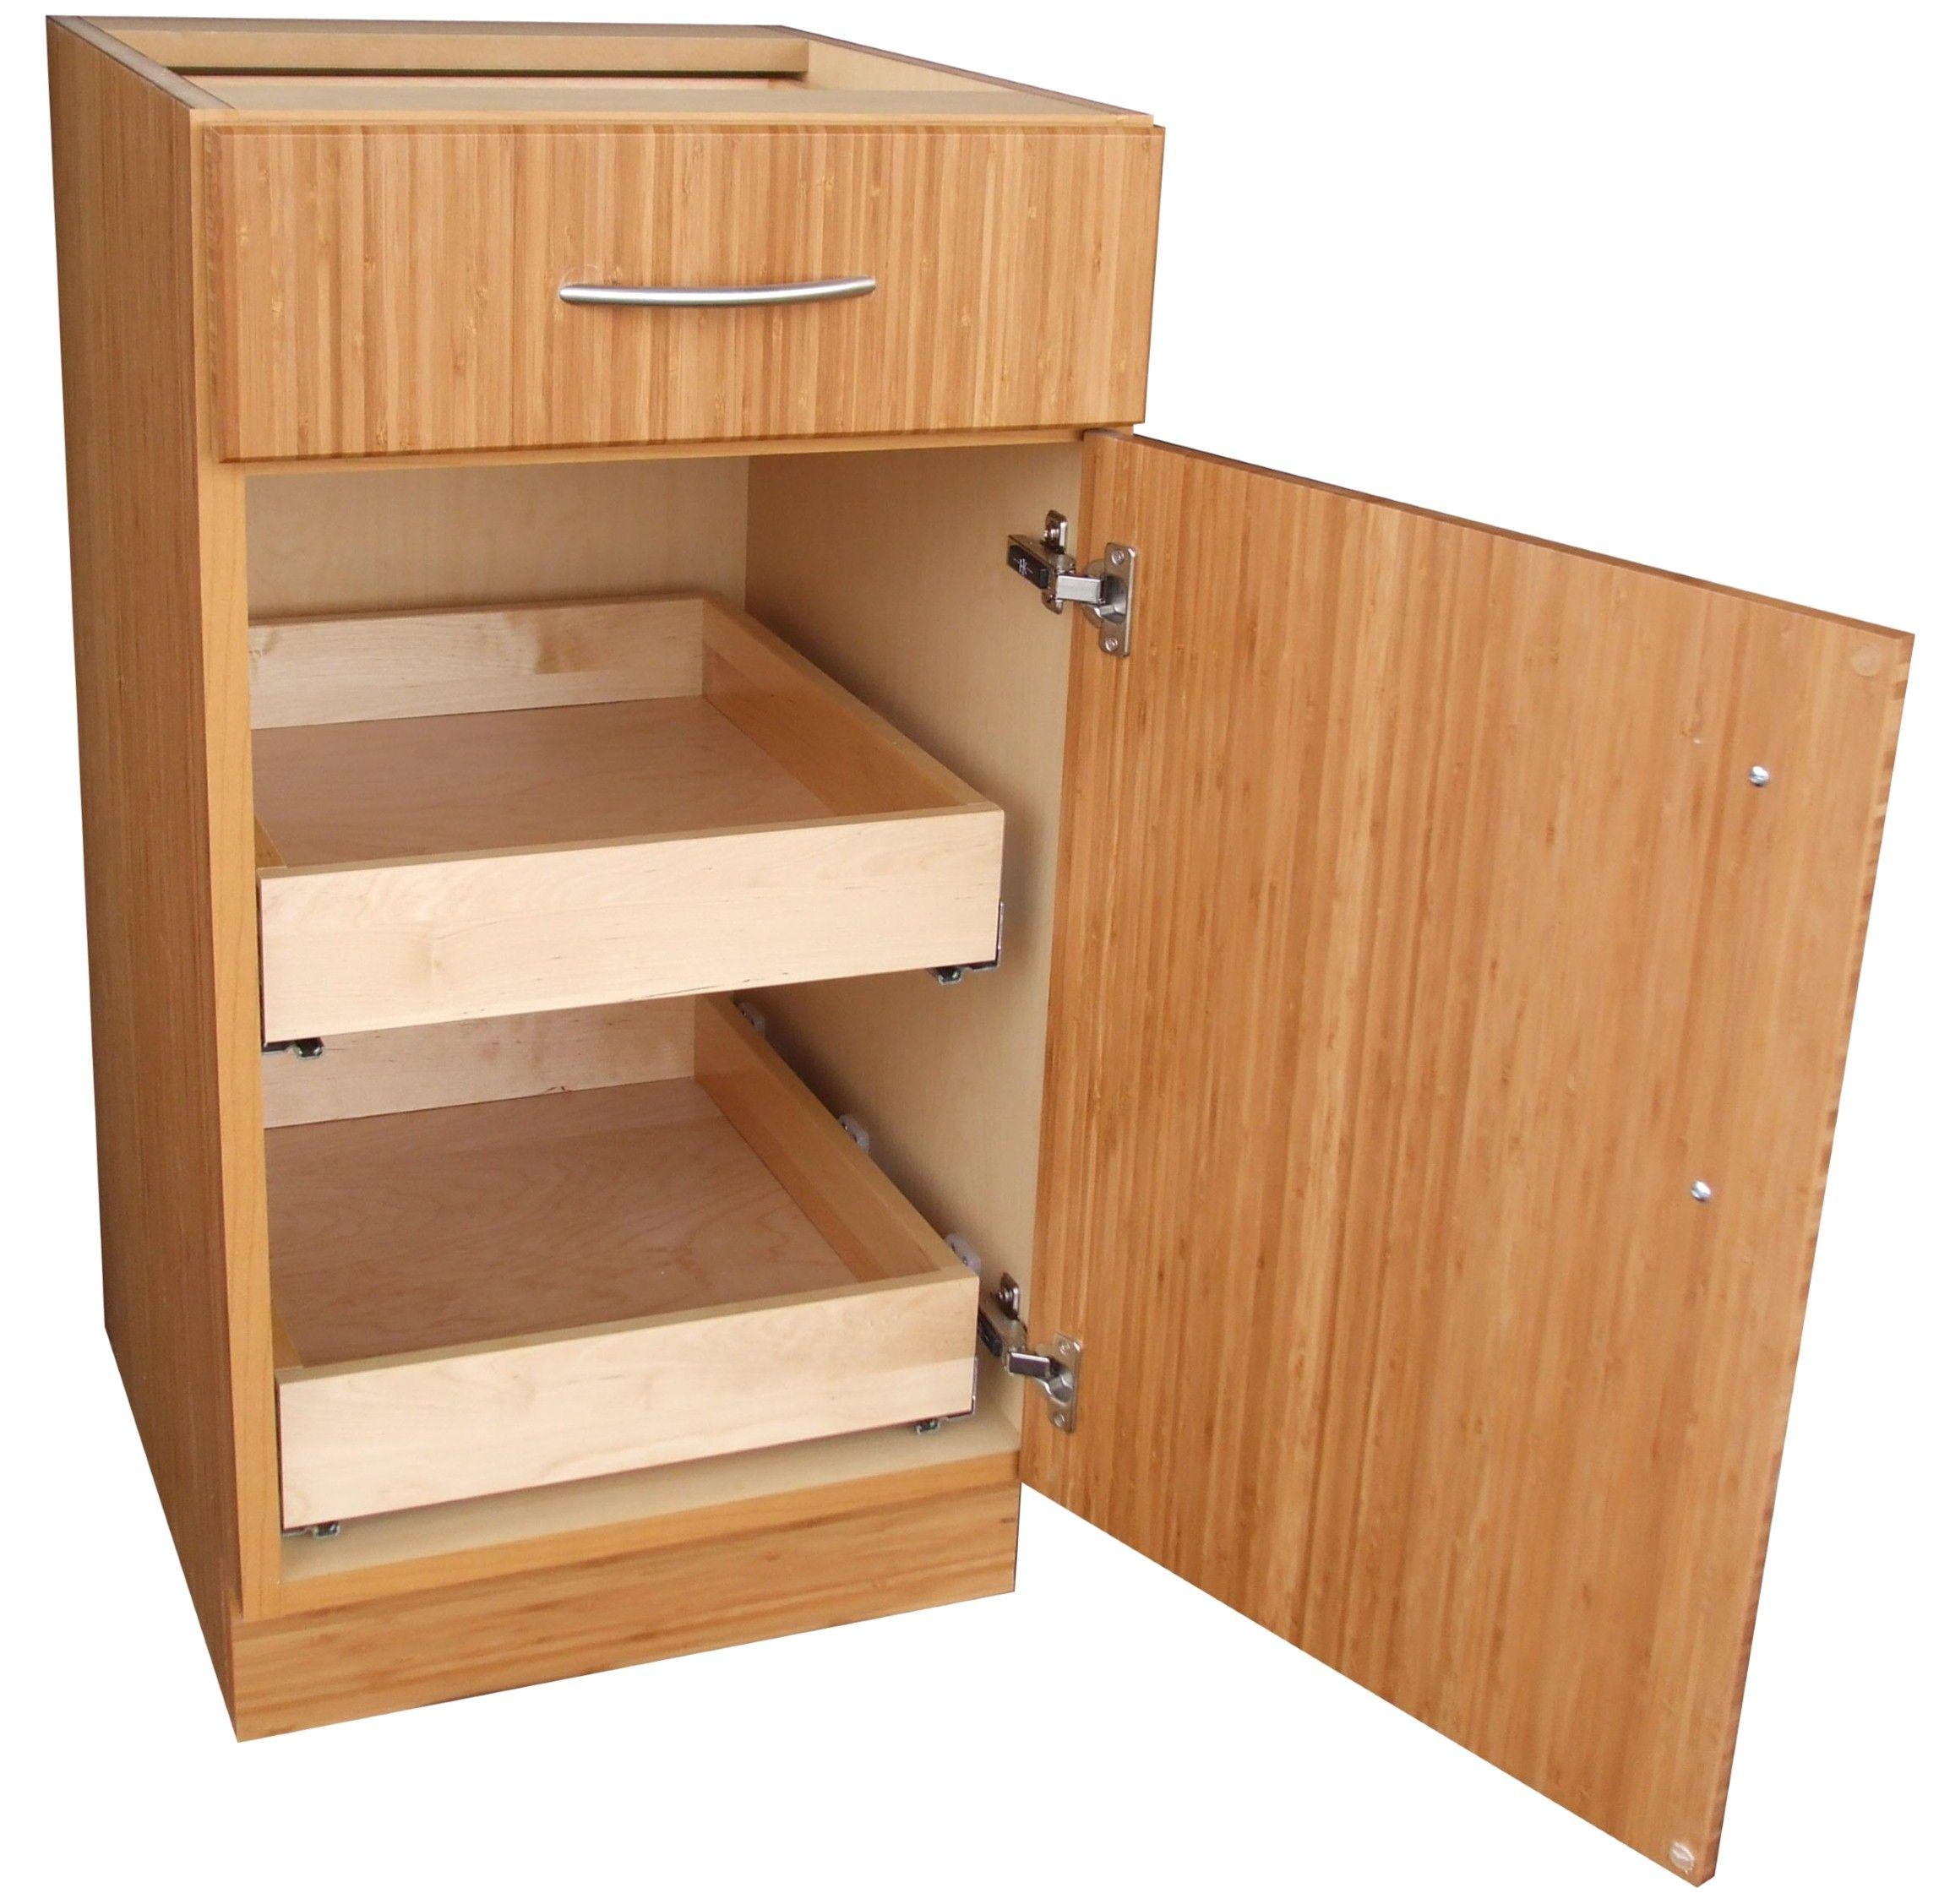 Holiday Kitchens Frameless Frameless Cabinets Framed Cabinetry Kitchen Cabinet Manufacturers